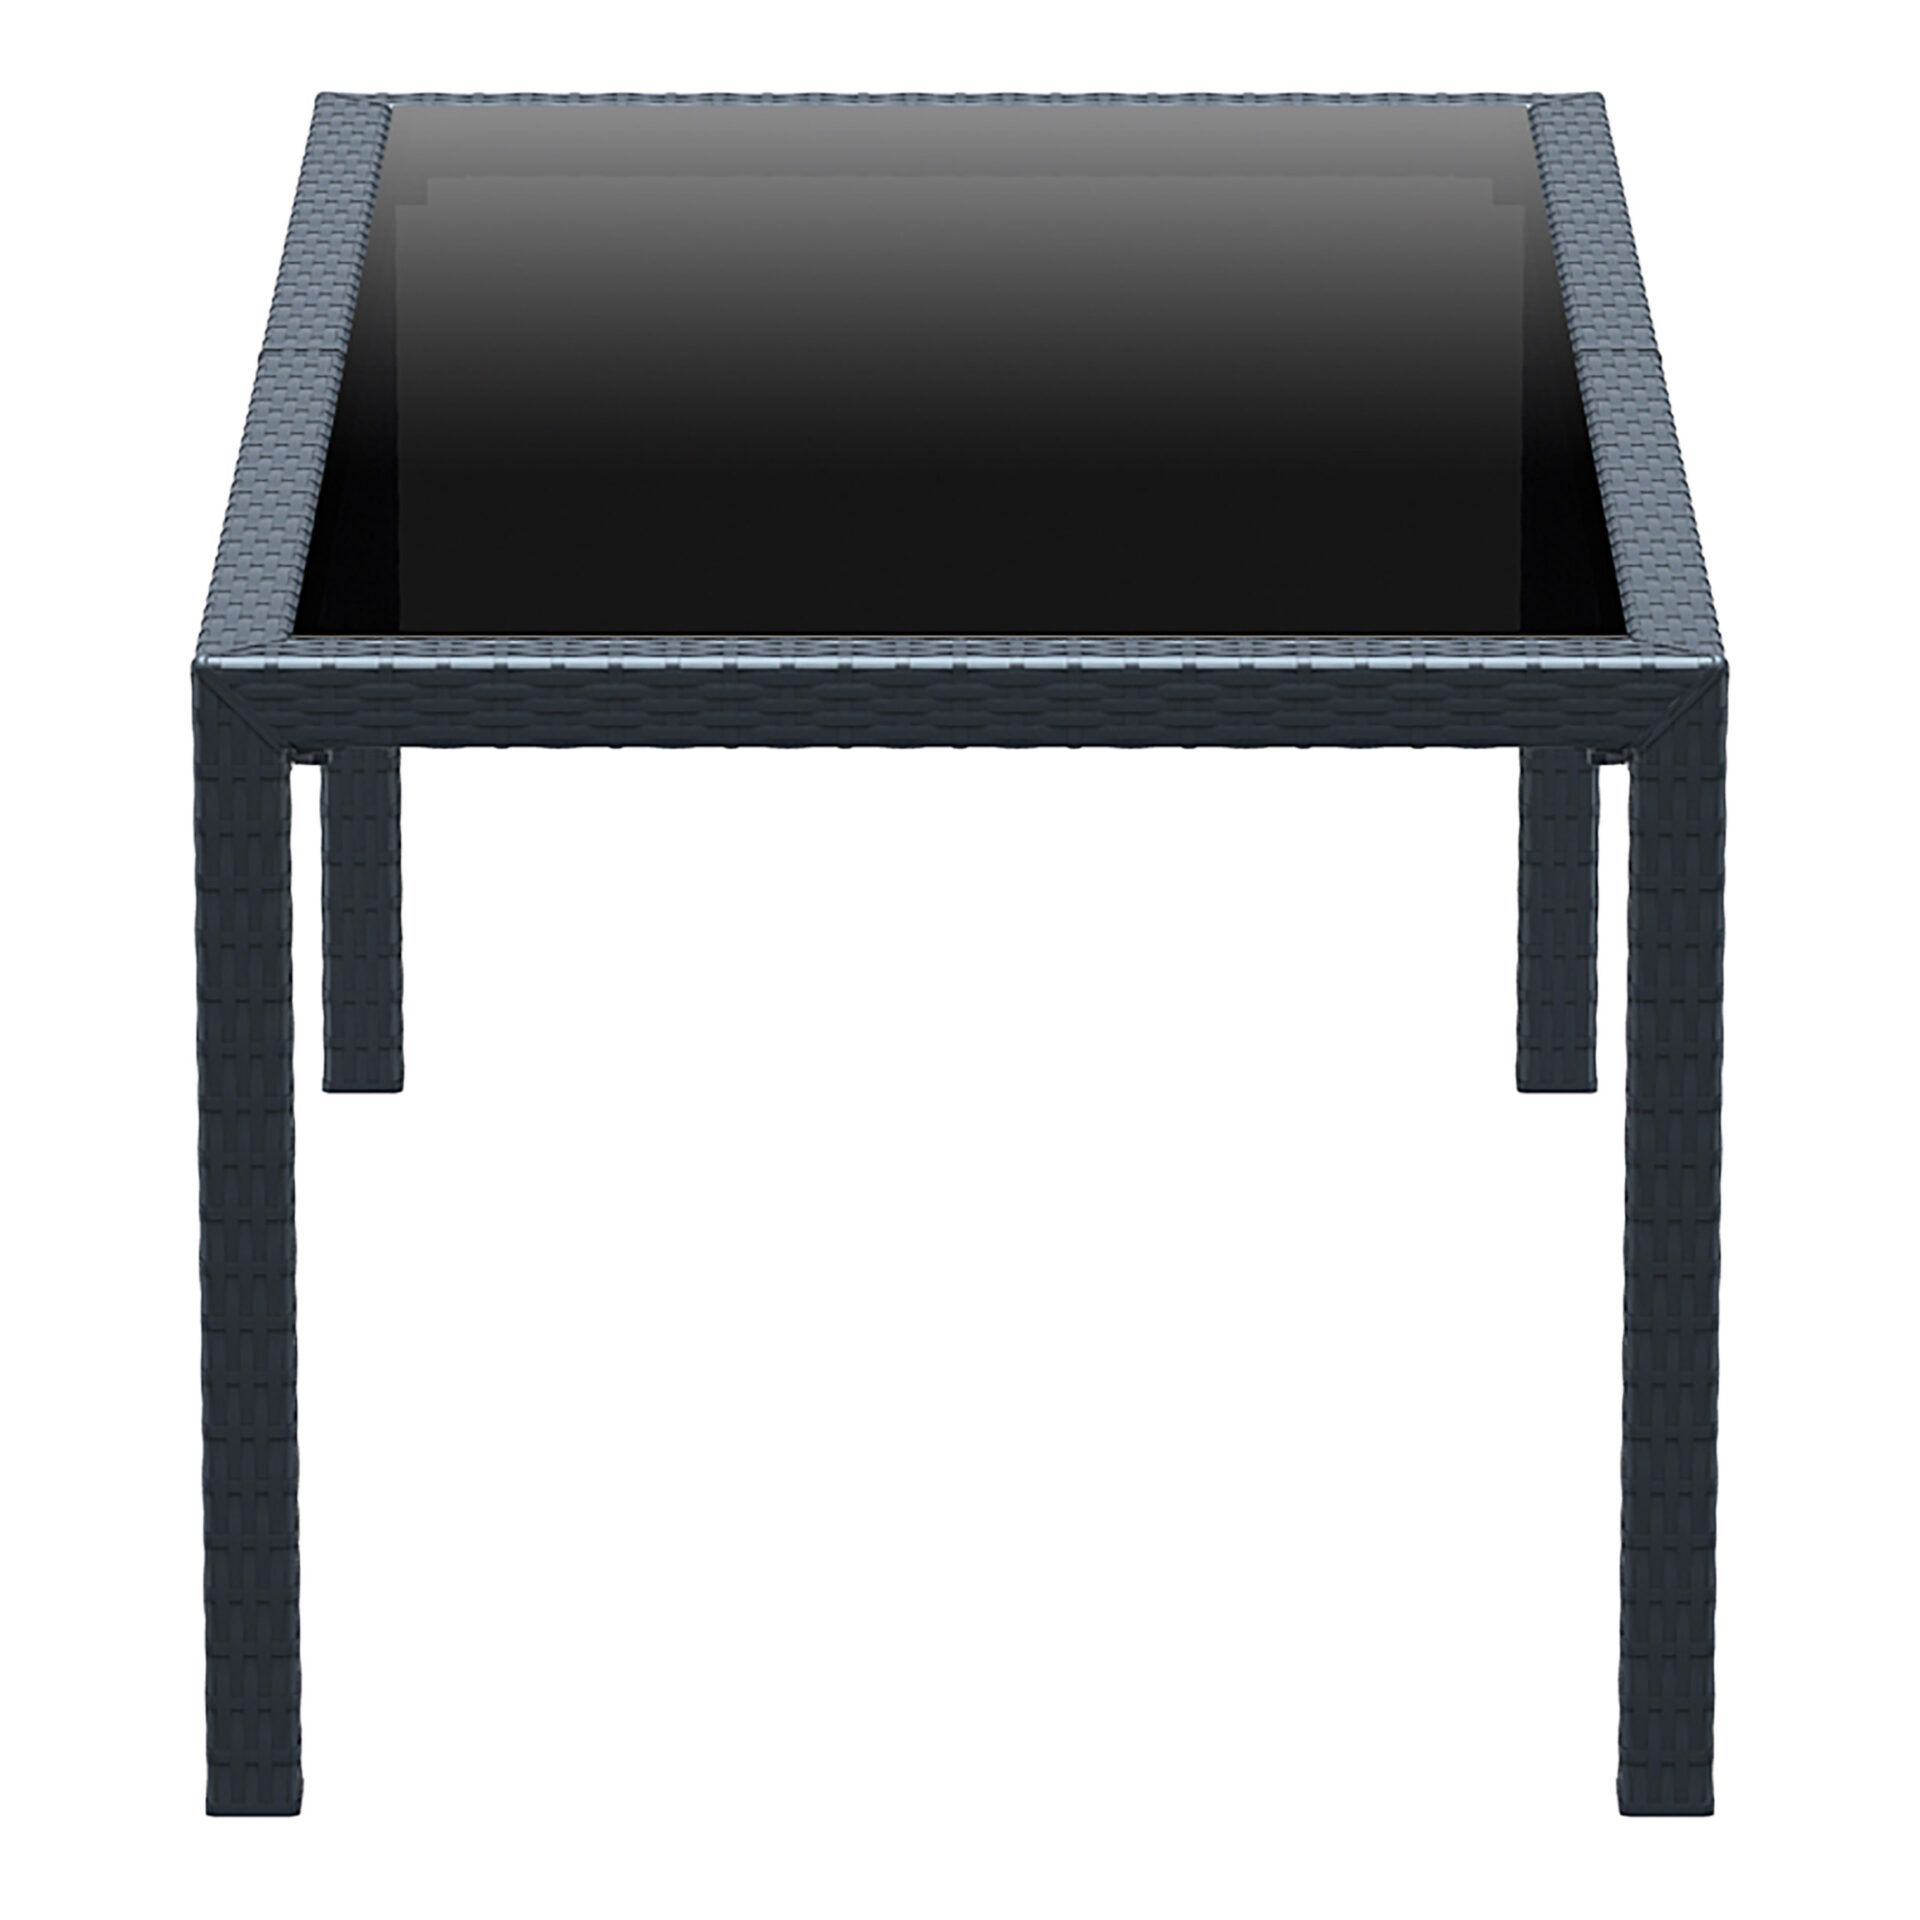 outdoor resin rattan dining glass top tahiti table darkgrey short edge